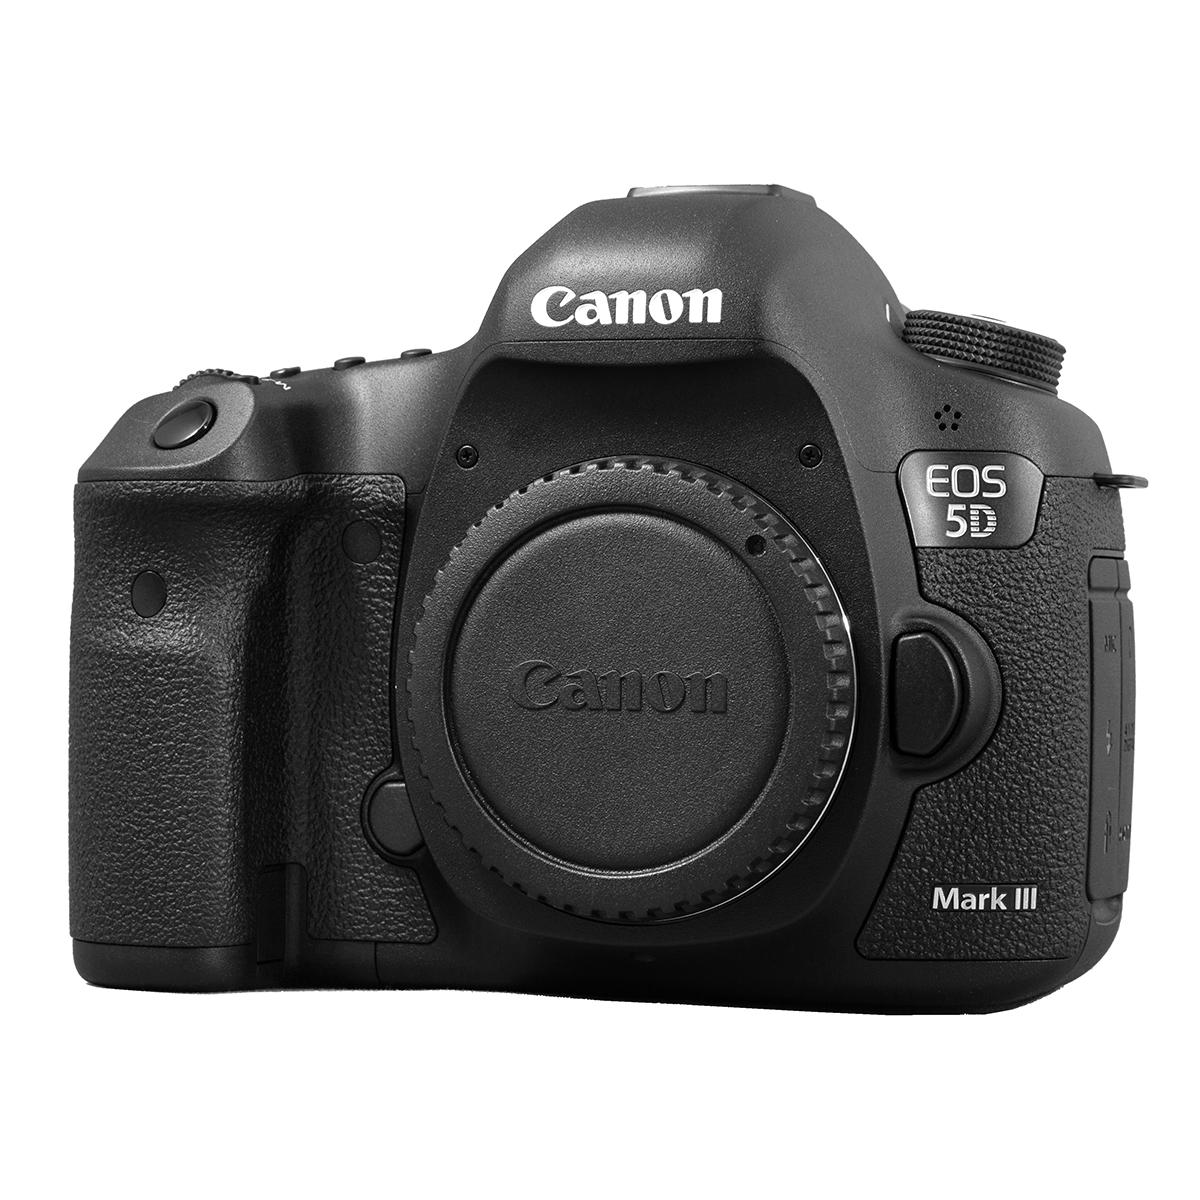 Immagine Canon 5D Mark III